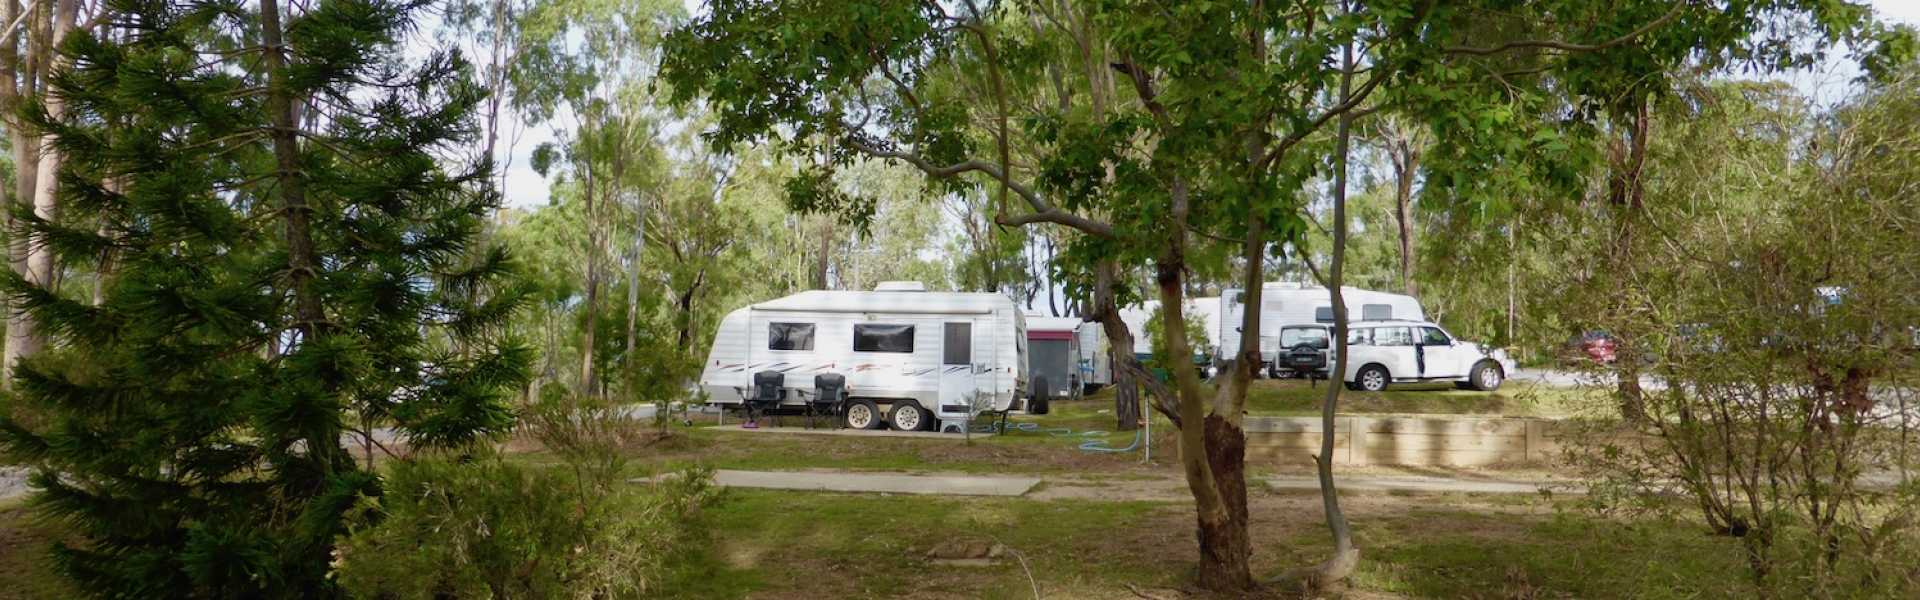 Kui Parks, Barambah Bush Caravan and Camping Park, Murgon, Sites